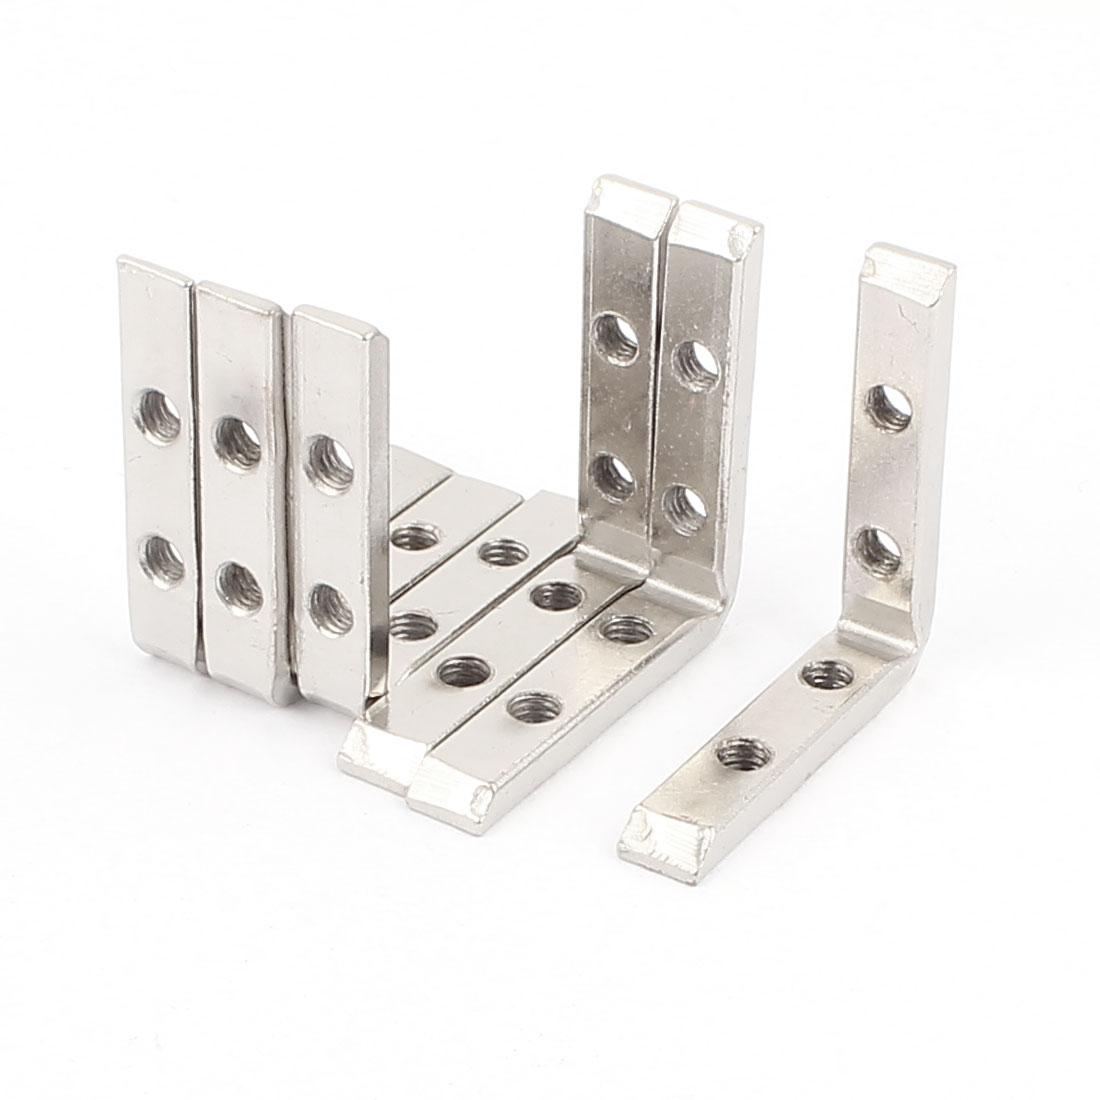 49.5mm x 49.5mm L Shape Shelf Support Corner Brace Metal Angle Bracket 6Pcs